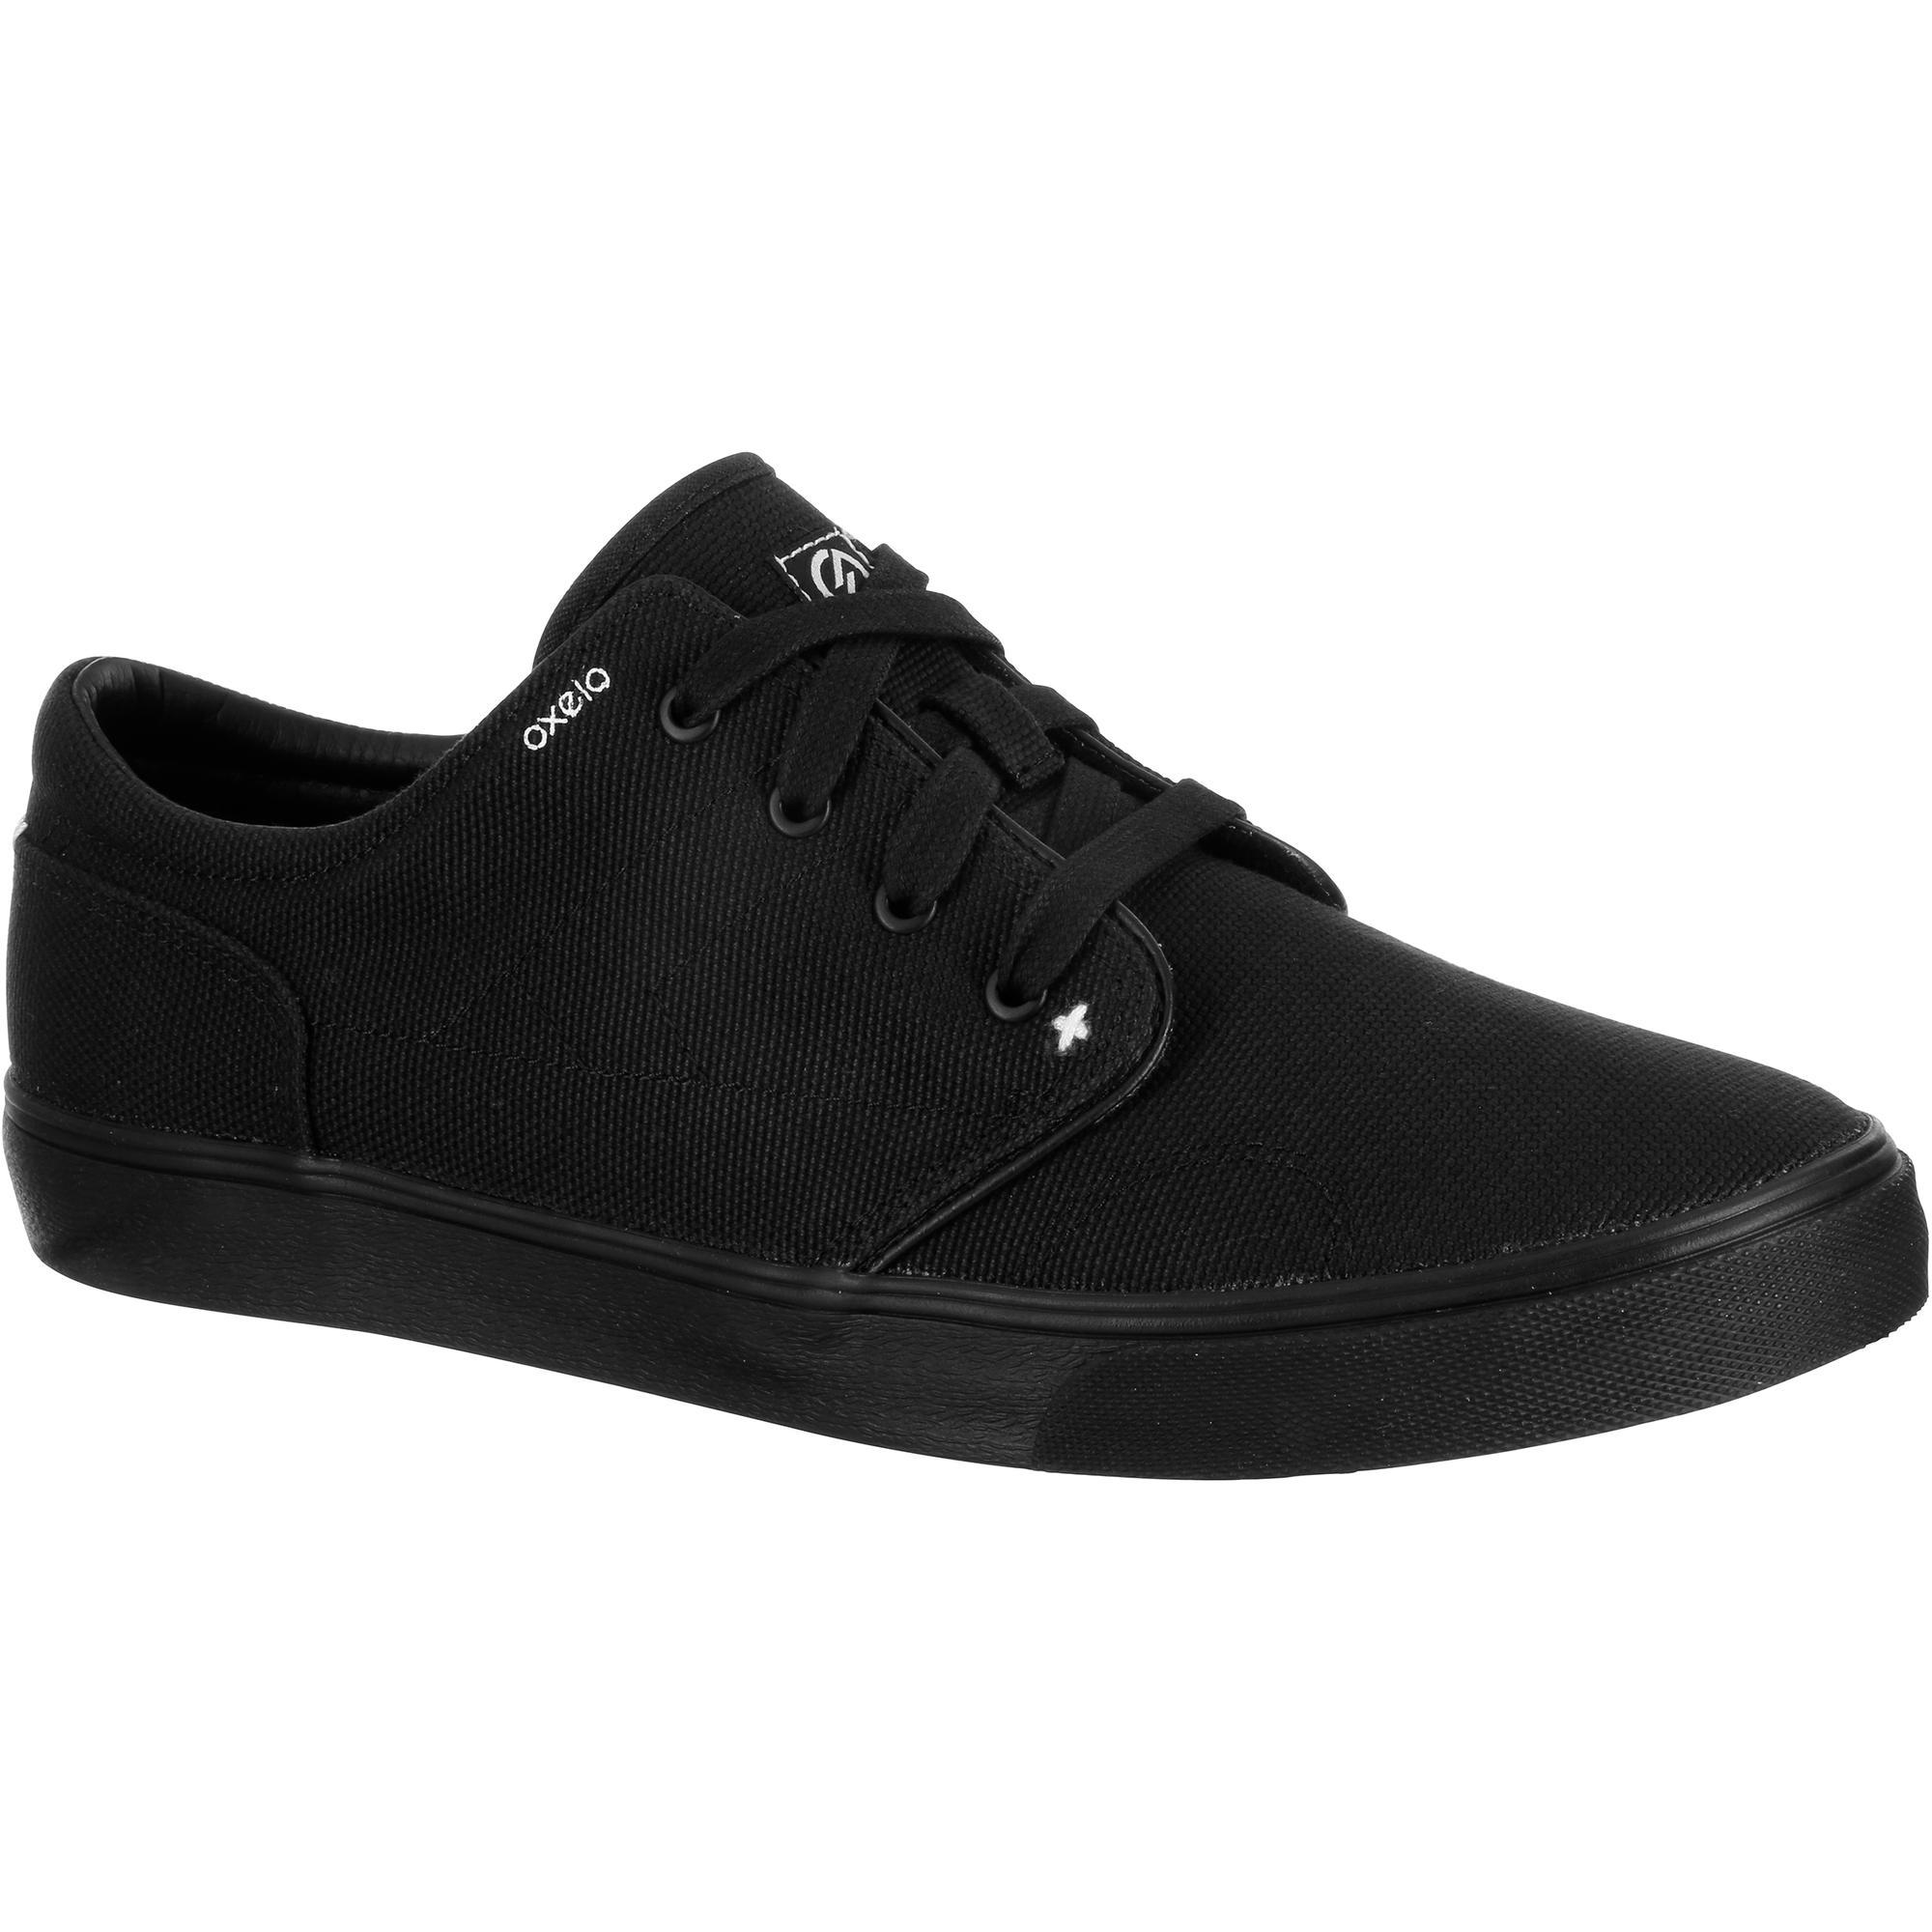 chaussures basses skateboard longboard adulte vulca canvas full black oxelo. Black Bedroom Furniture Sets. Home Design Ideas